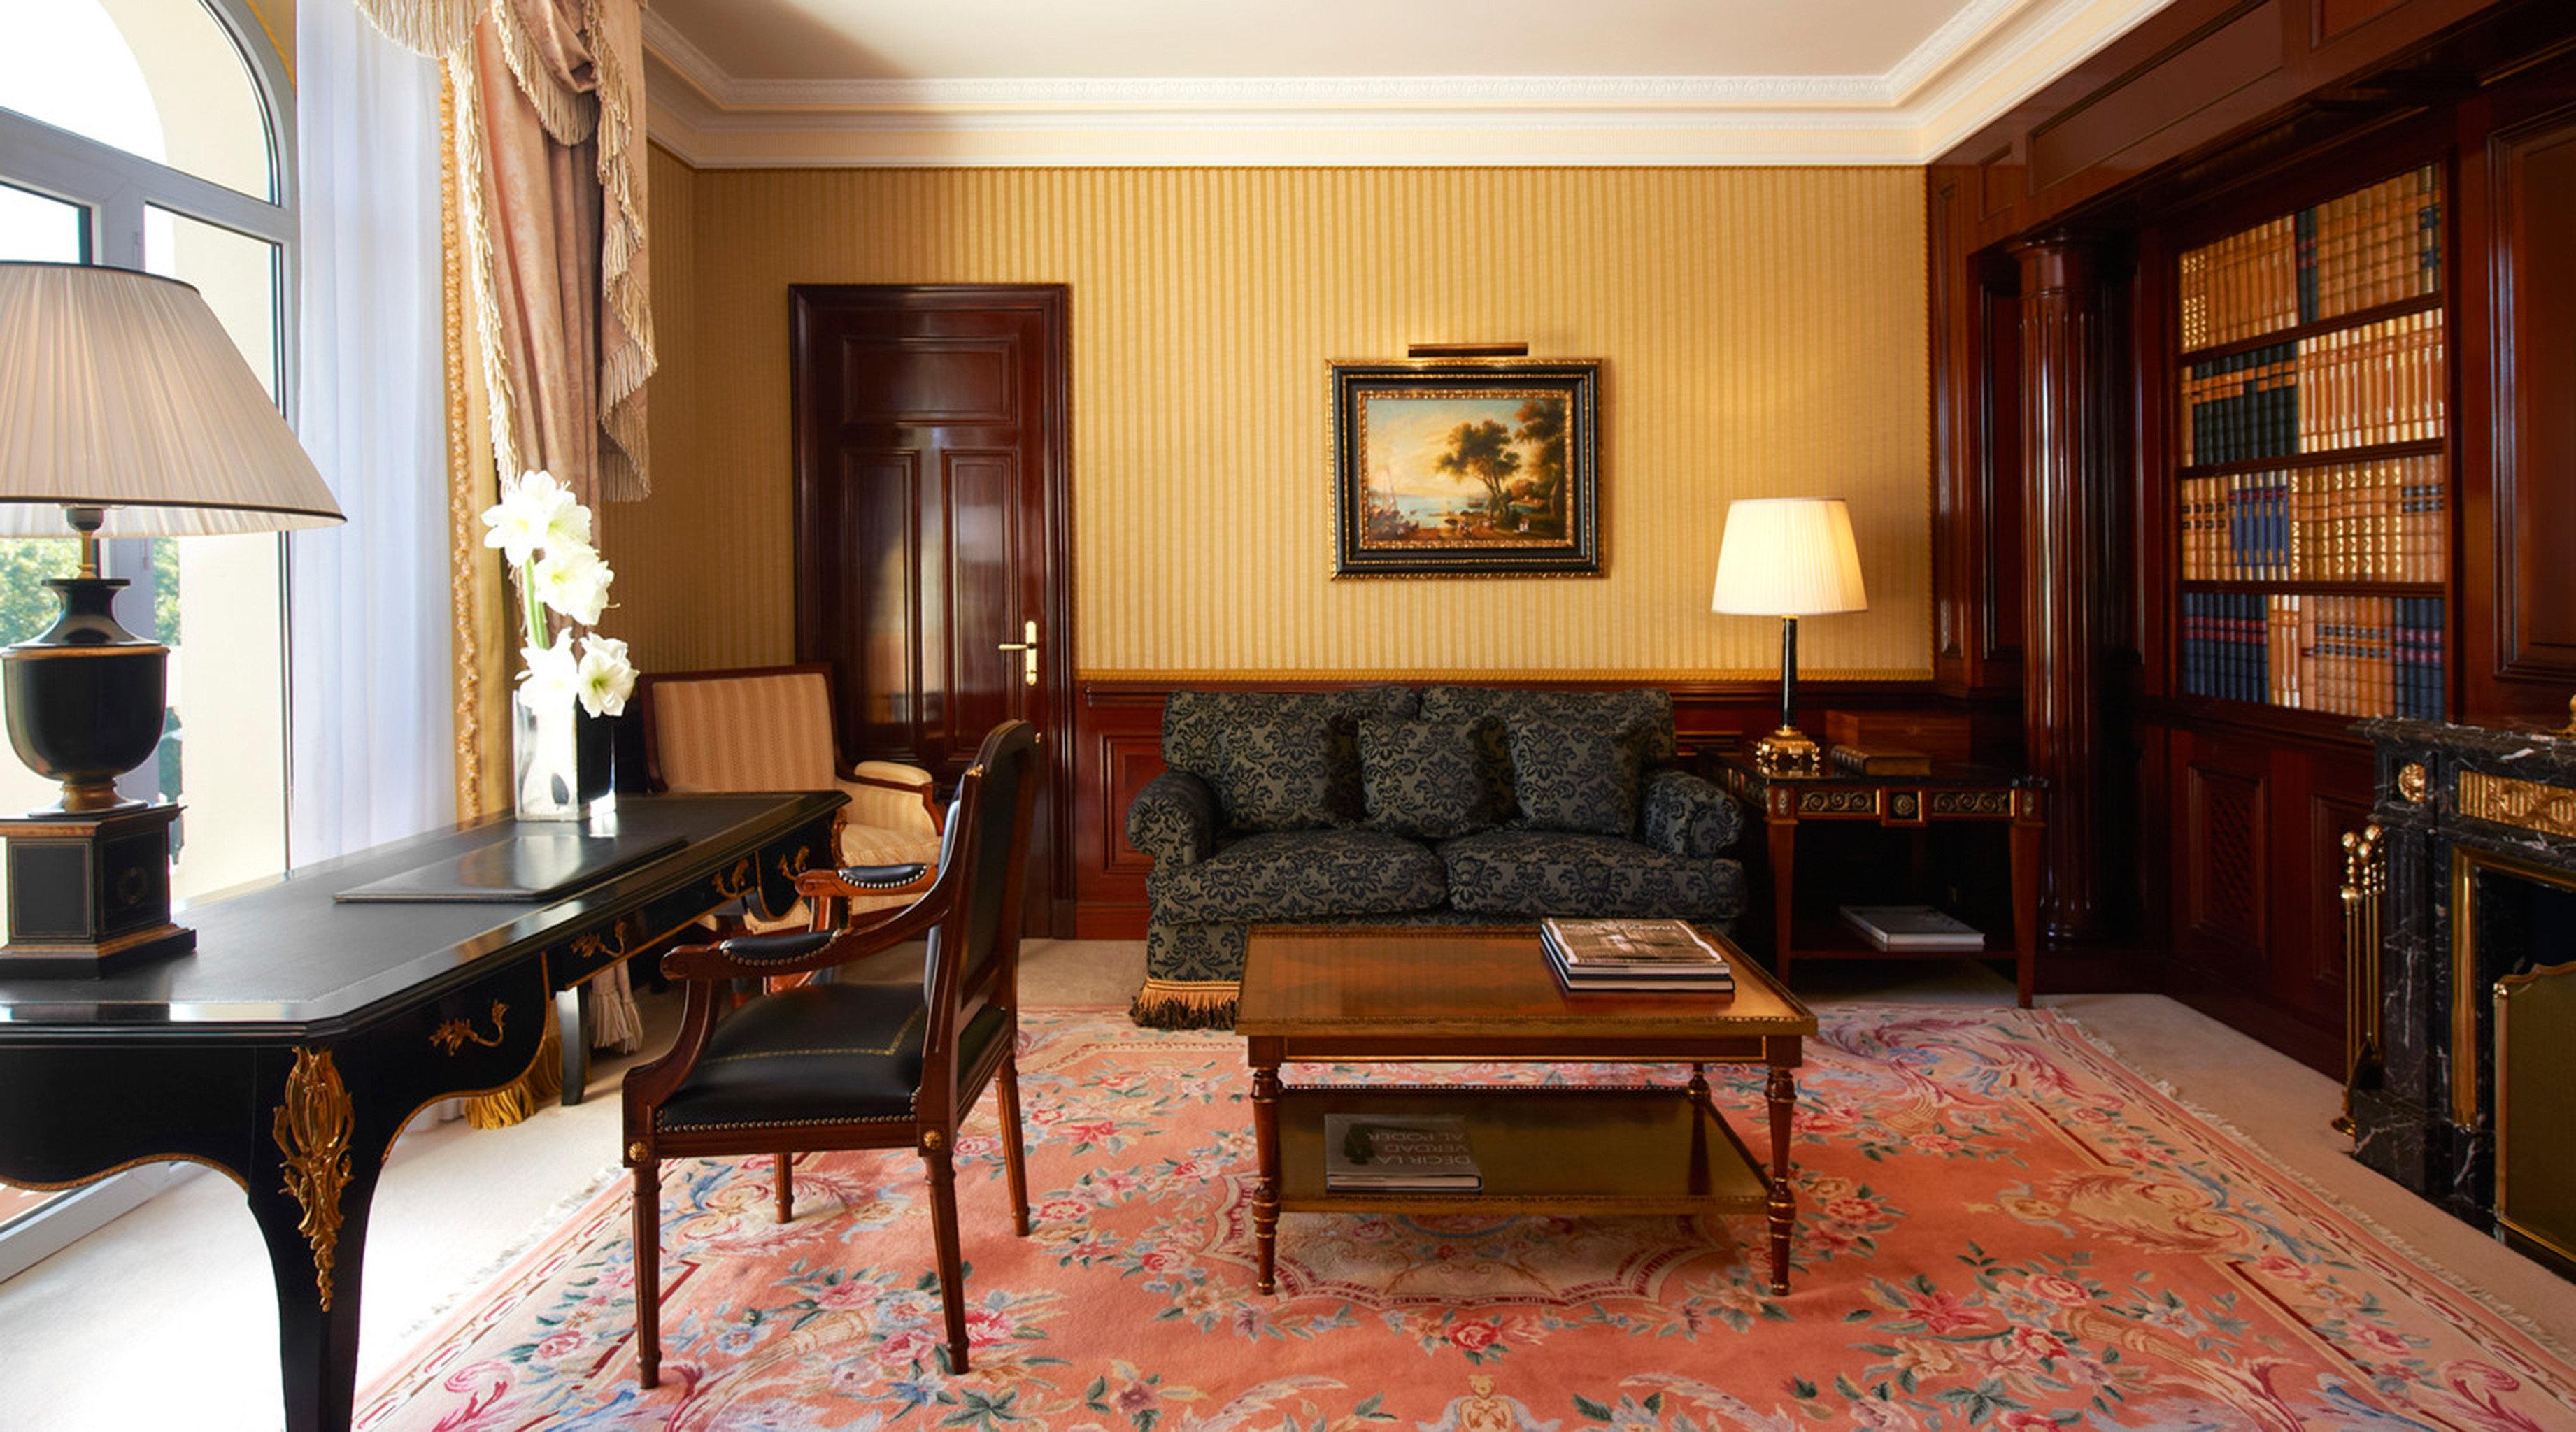 Elegant Historic Hotels Lounge Luxury Madrid Spain property living room home Suite recreation room mansion cottage